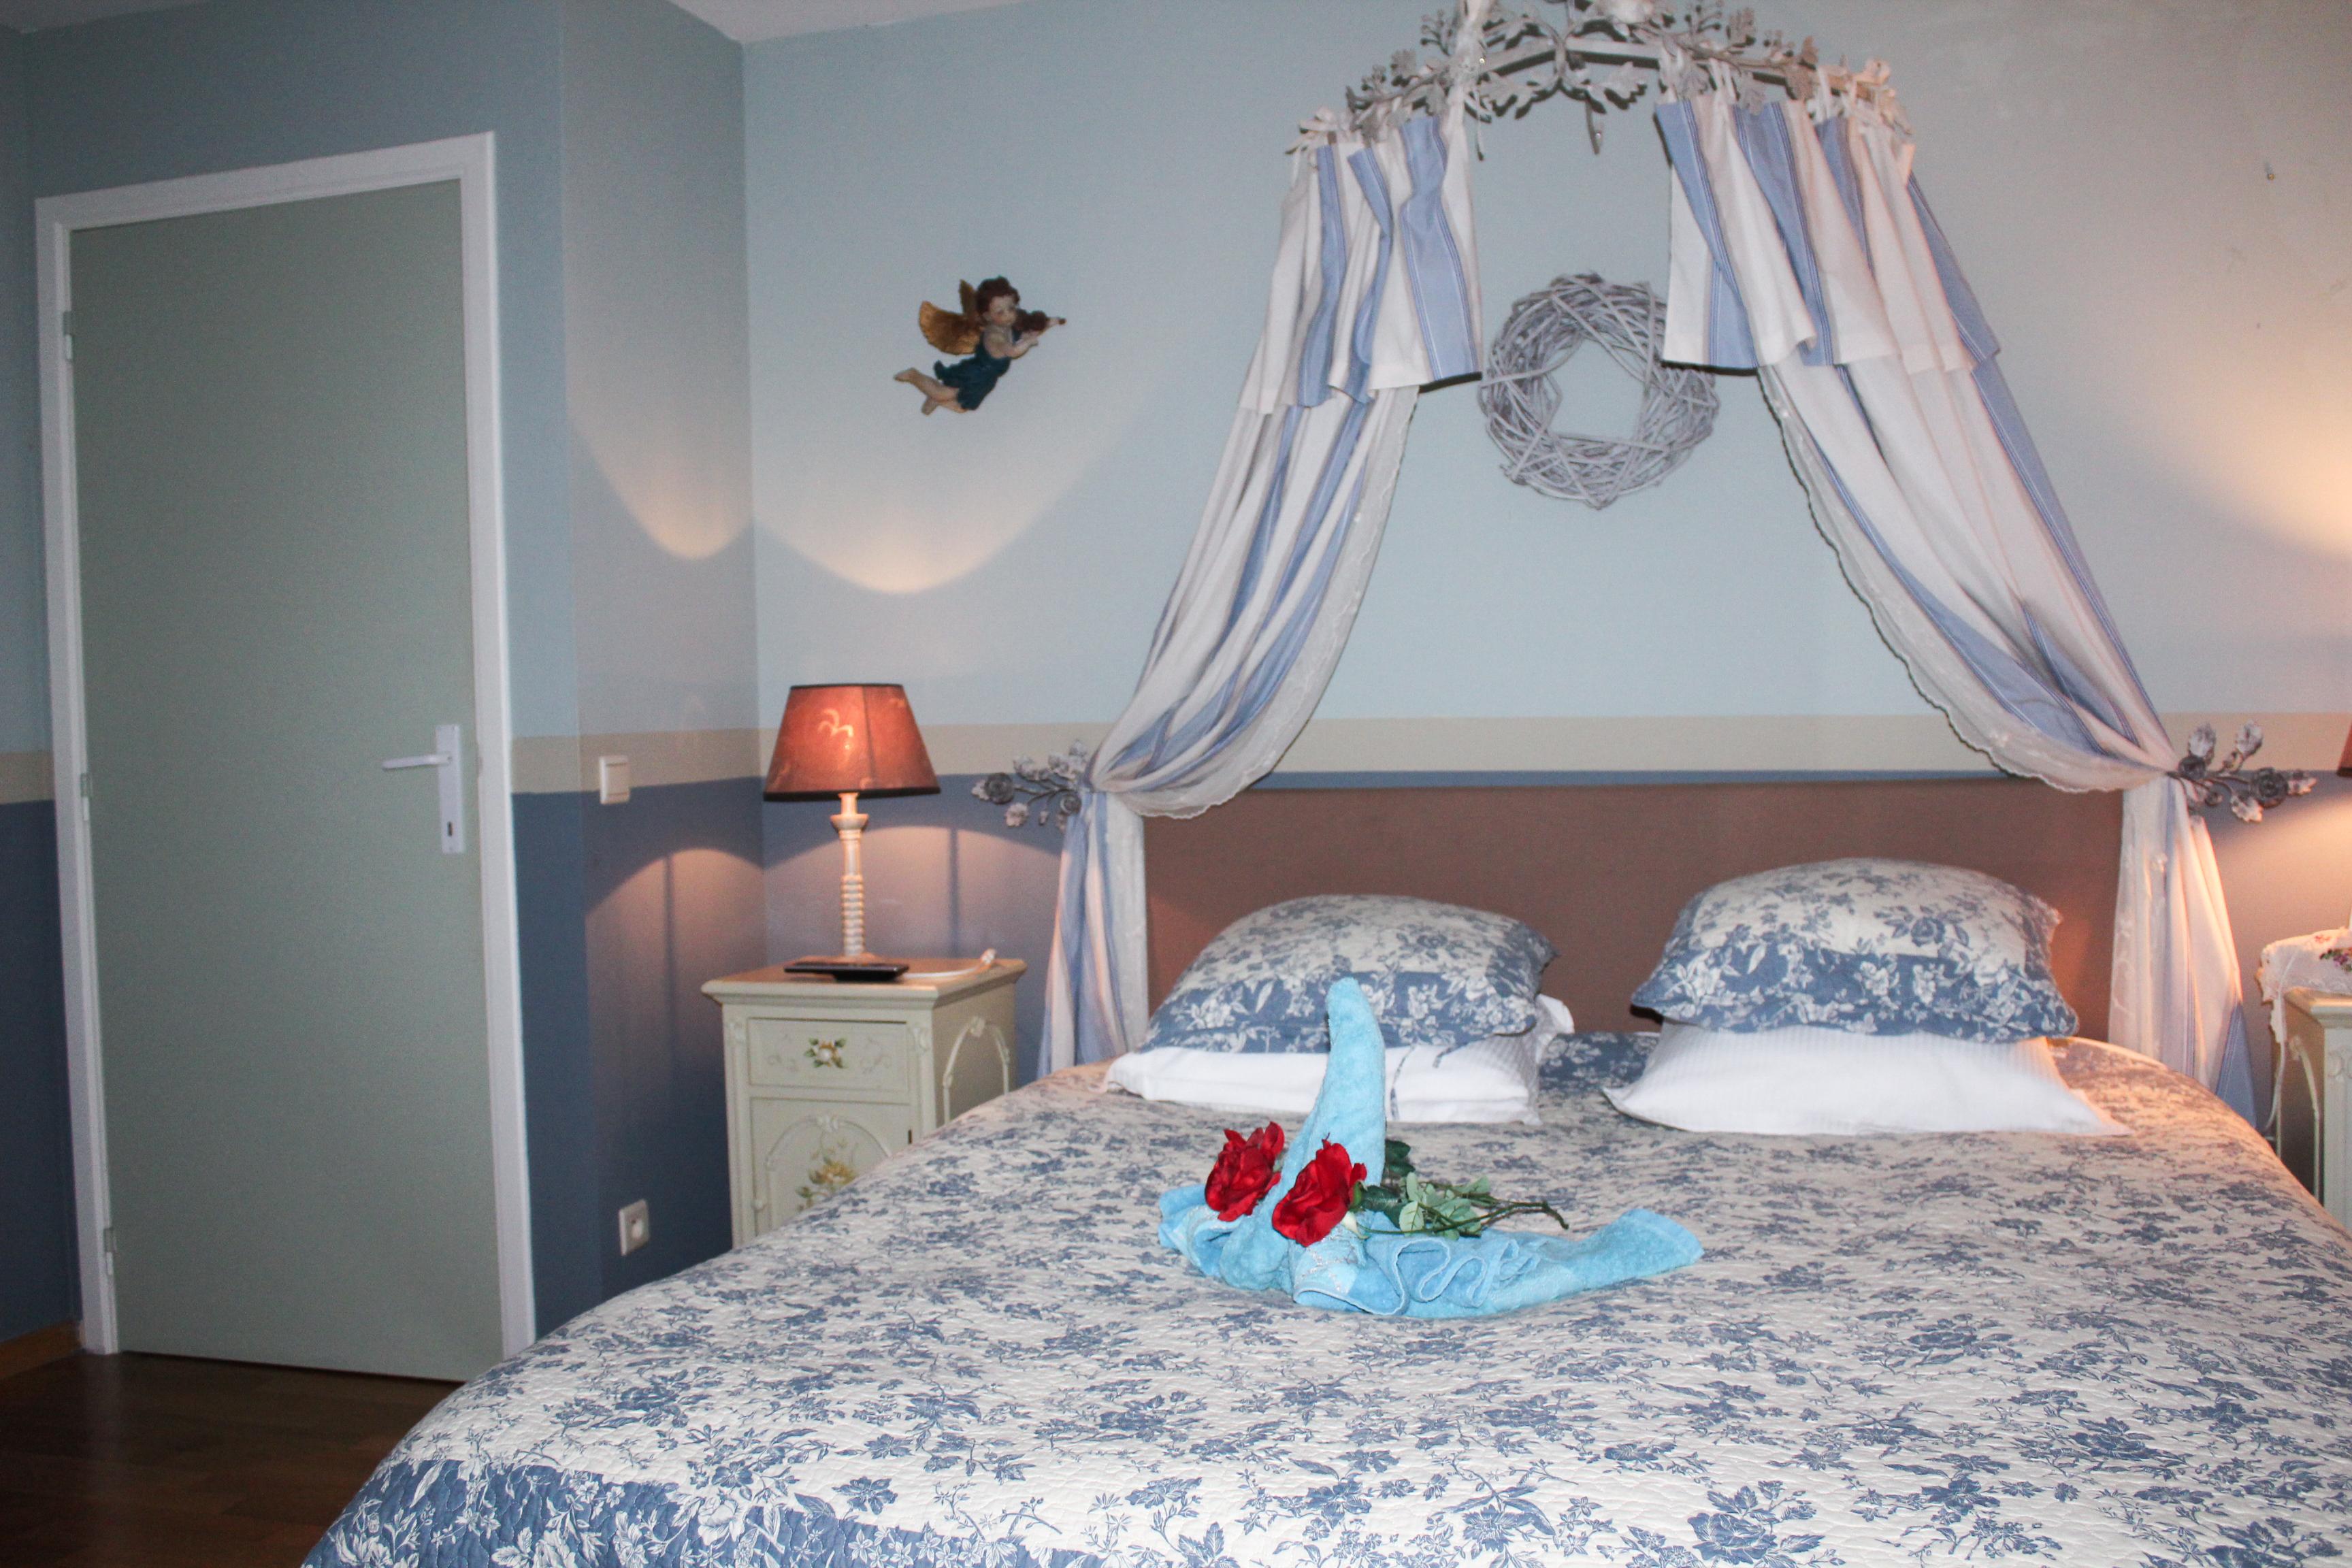 Bbhoevewestdijk blauwe kamer - Blauwe nachtkamer ...